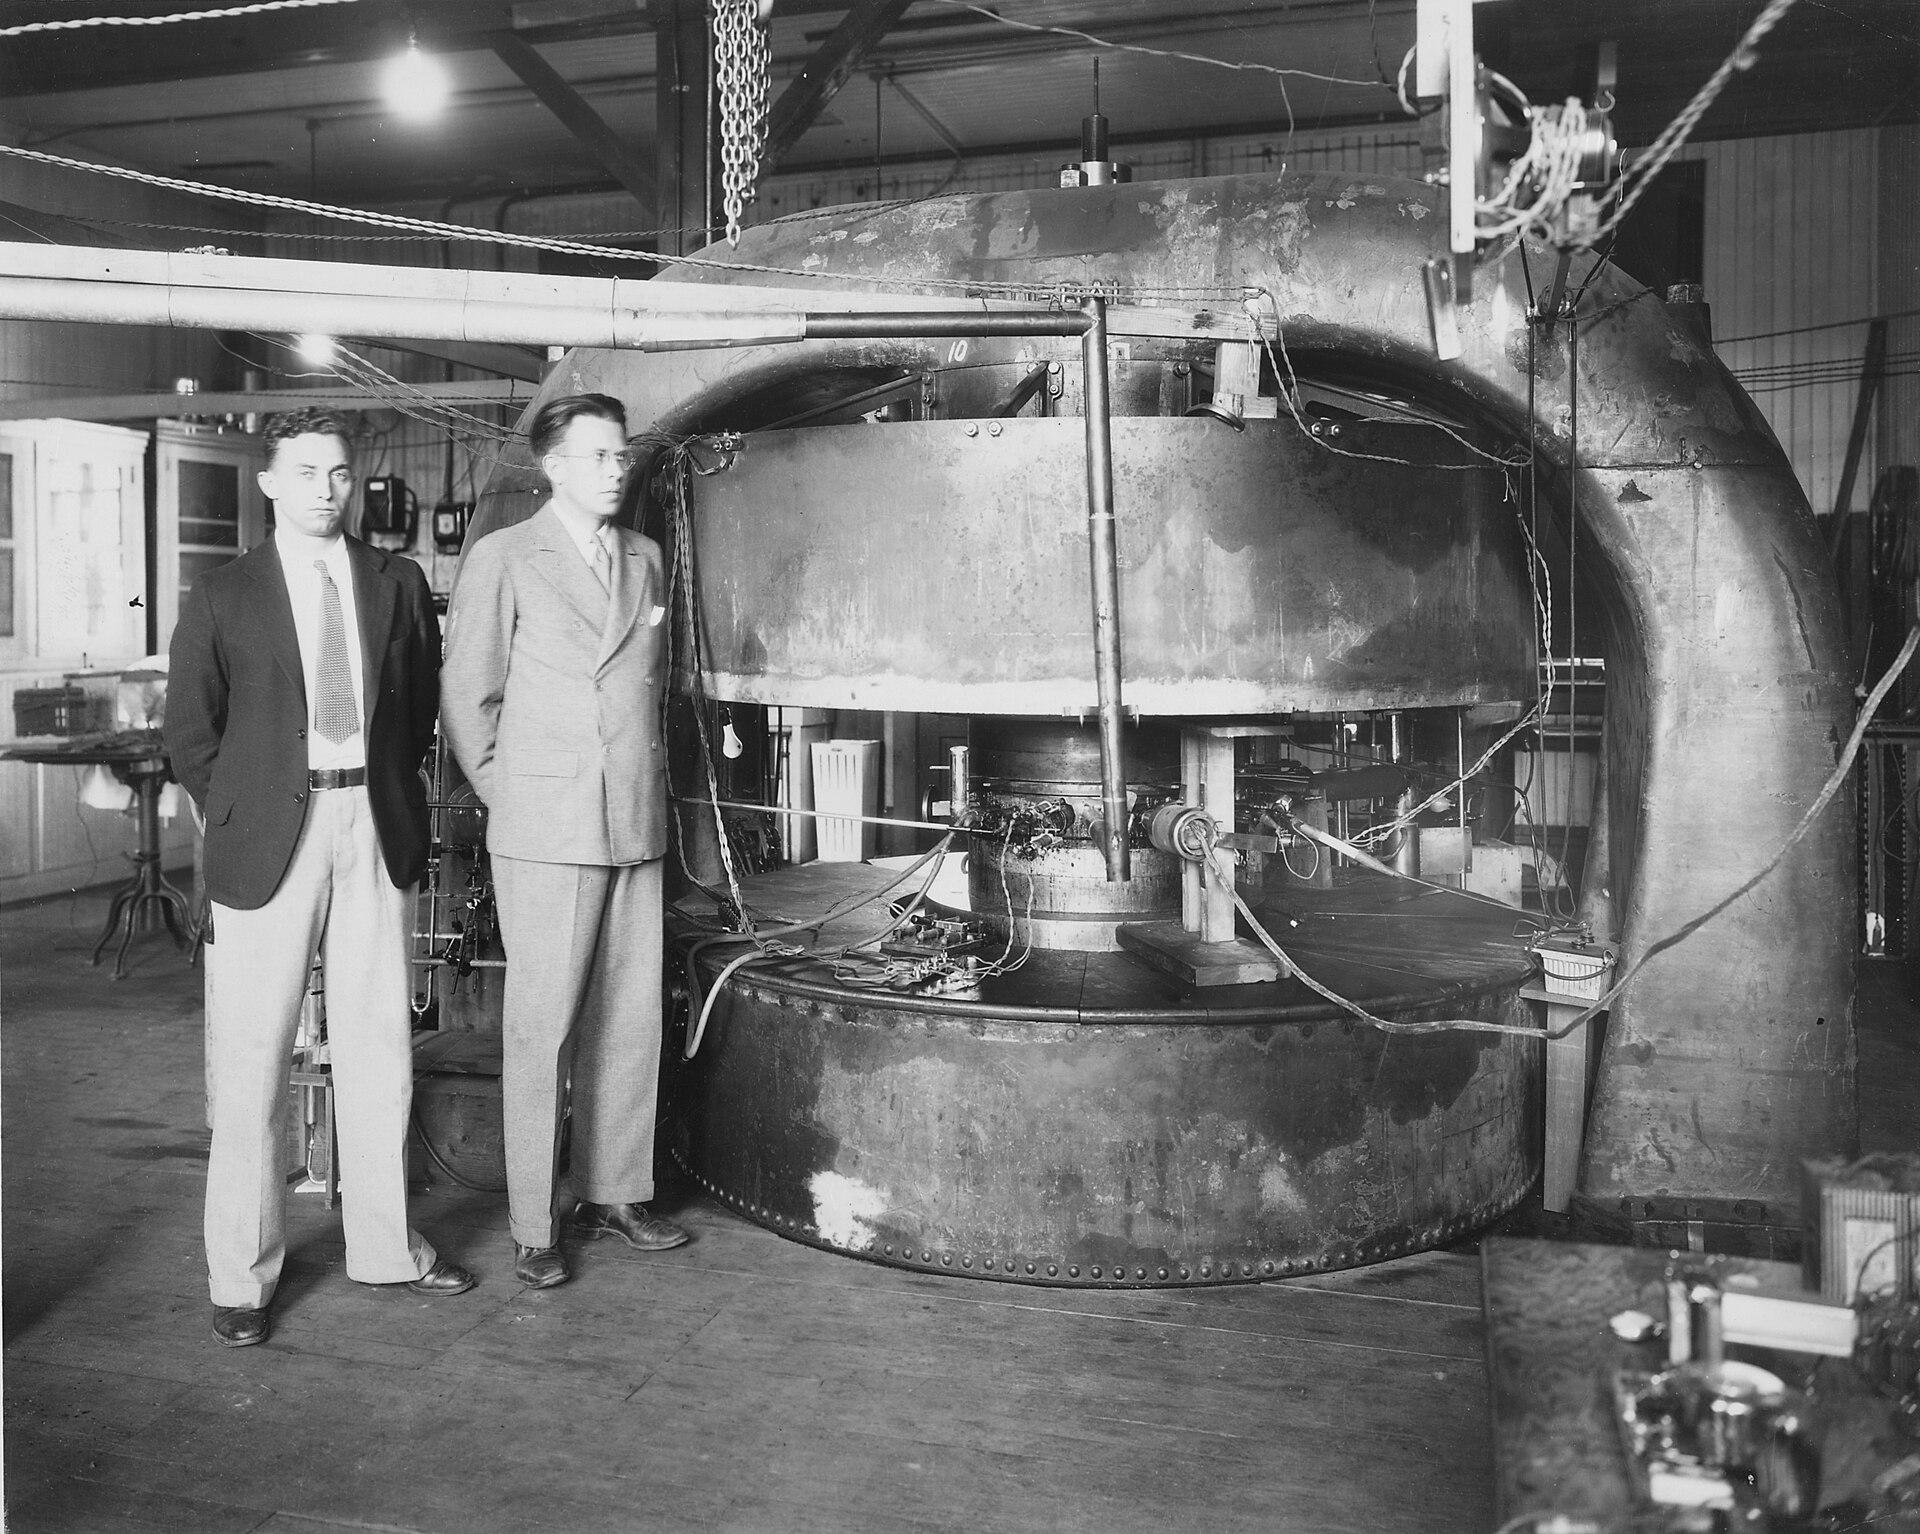 Px Inch Cyclotron